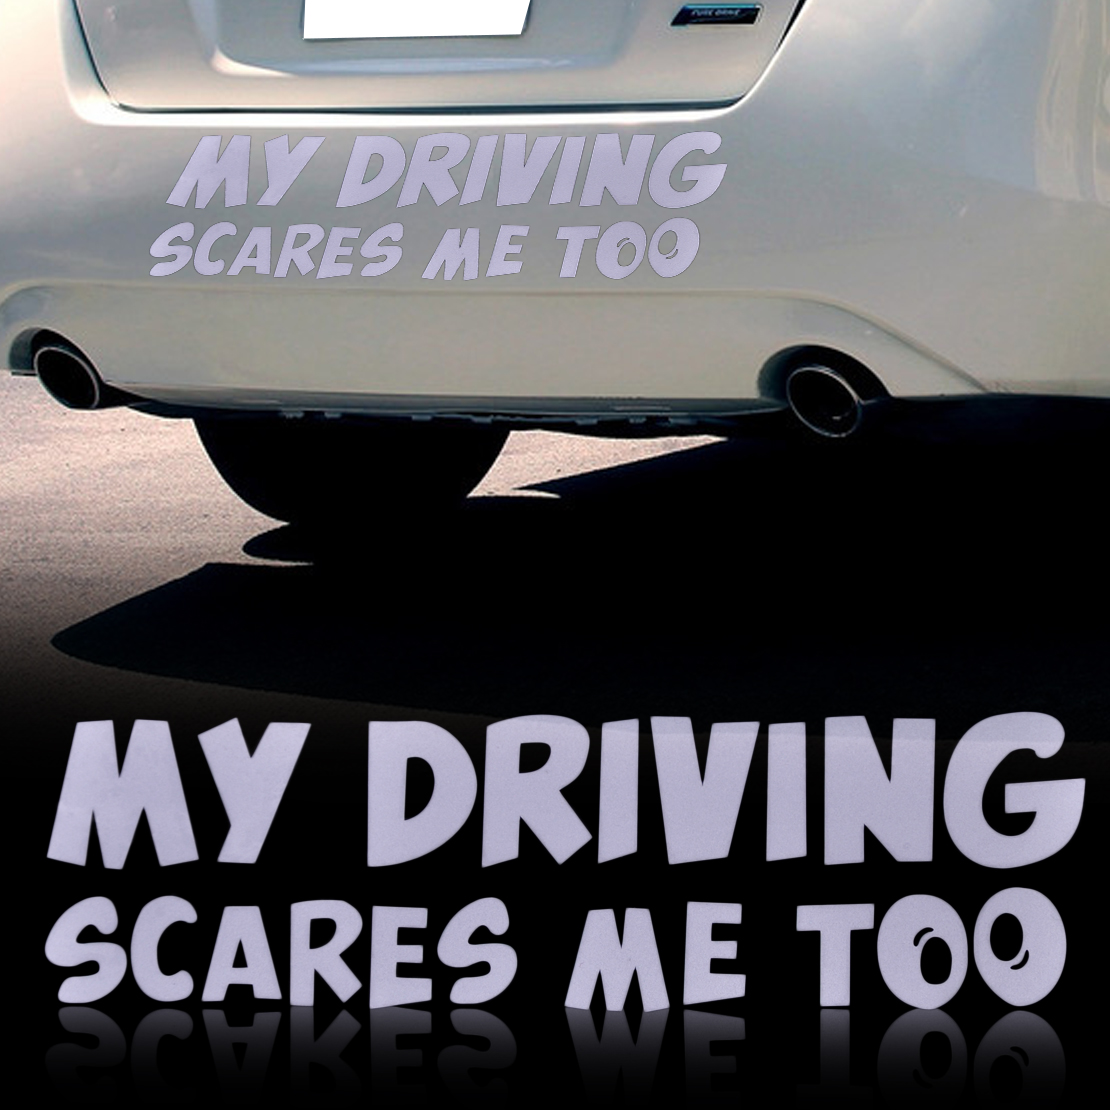 Design my car sticker - Car Stickers My Driving Scares Me Too Window Bumper Van Custom Funny Vinyl Sticker Decals For